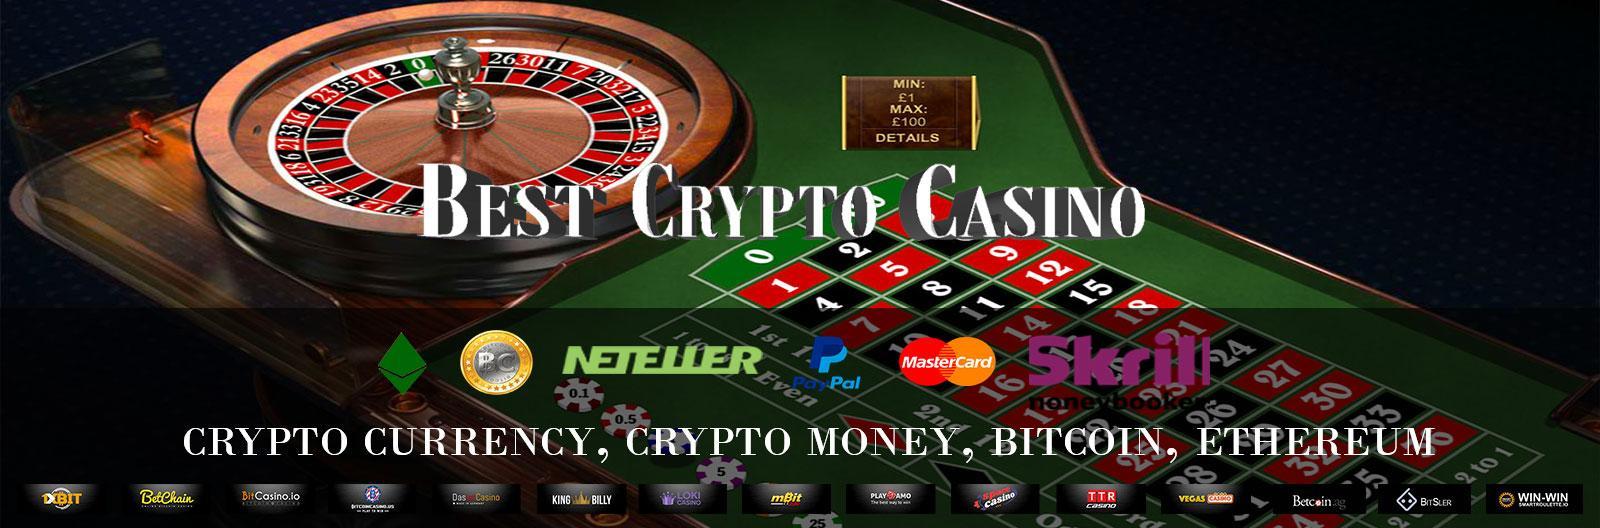 Best vegas casino games to play